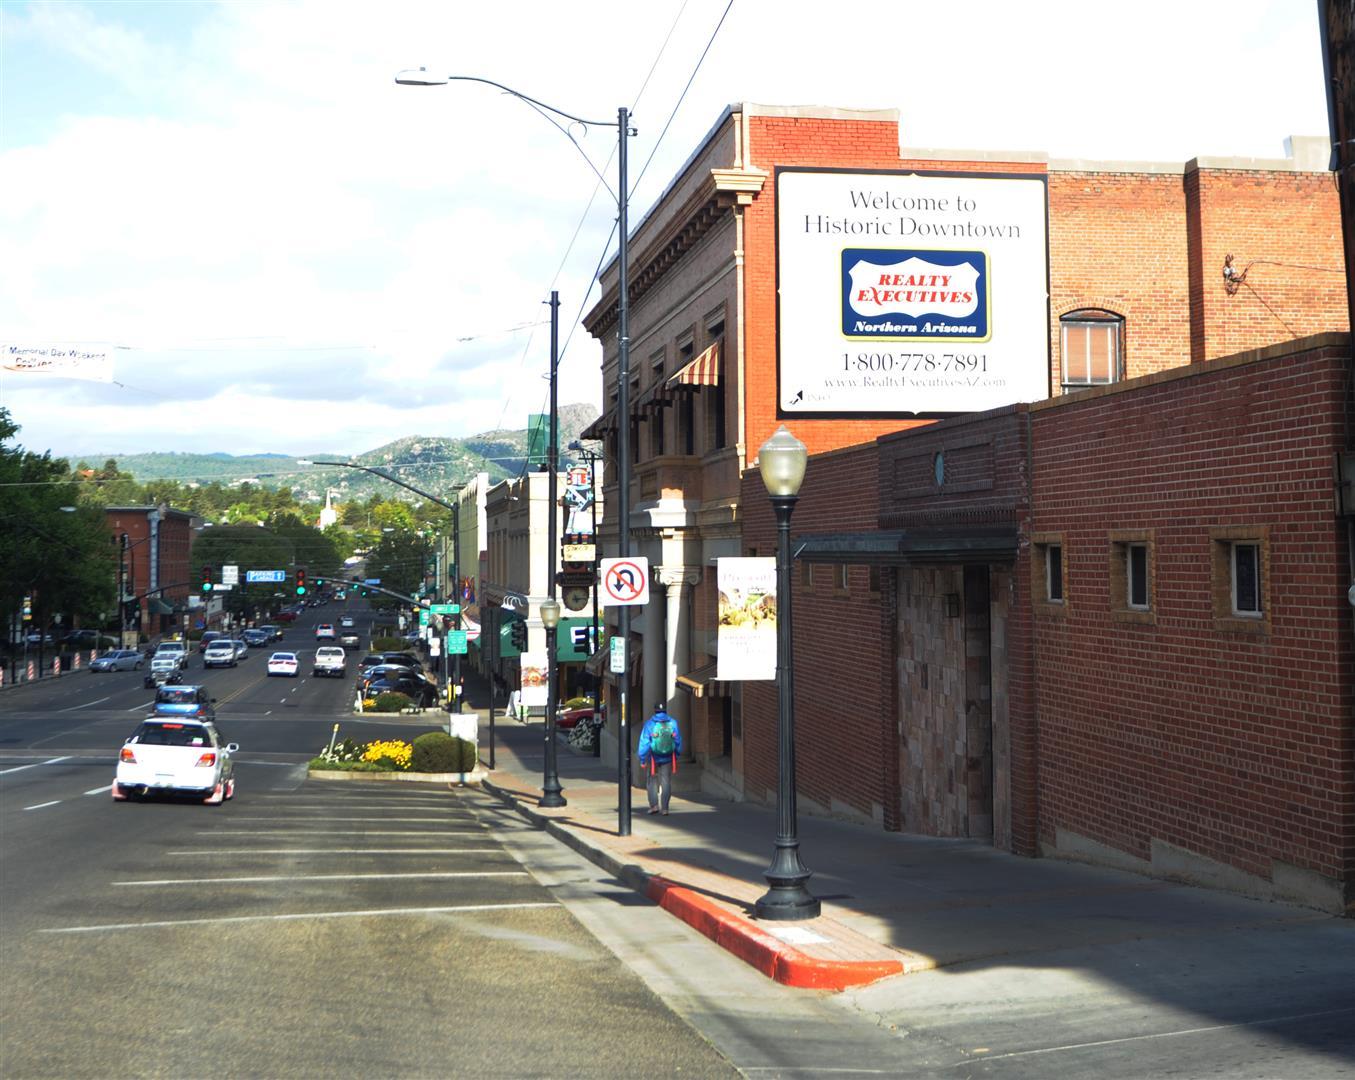 Realty Executives Northern Arizona - Downtown Prescott